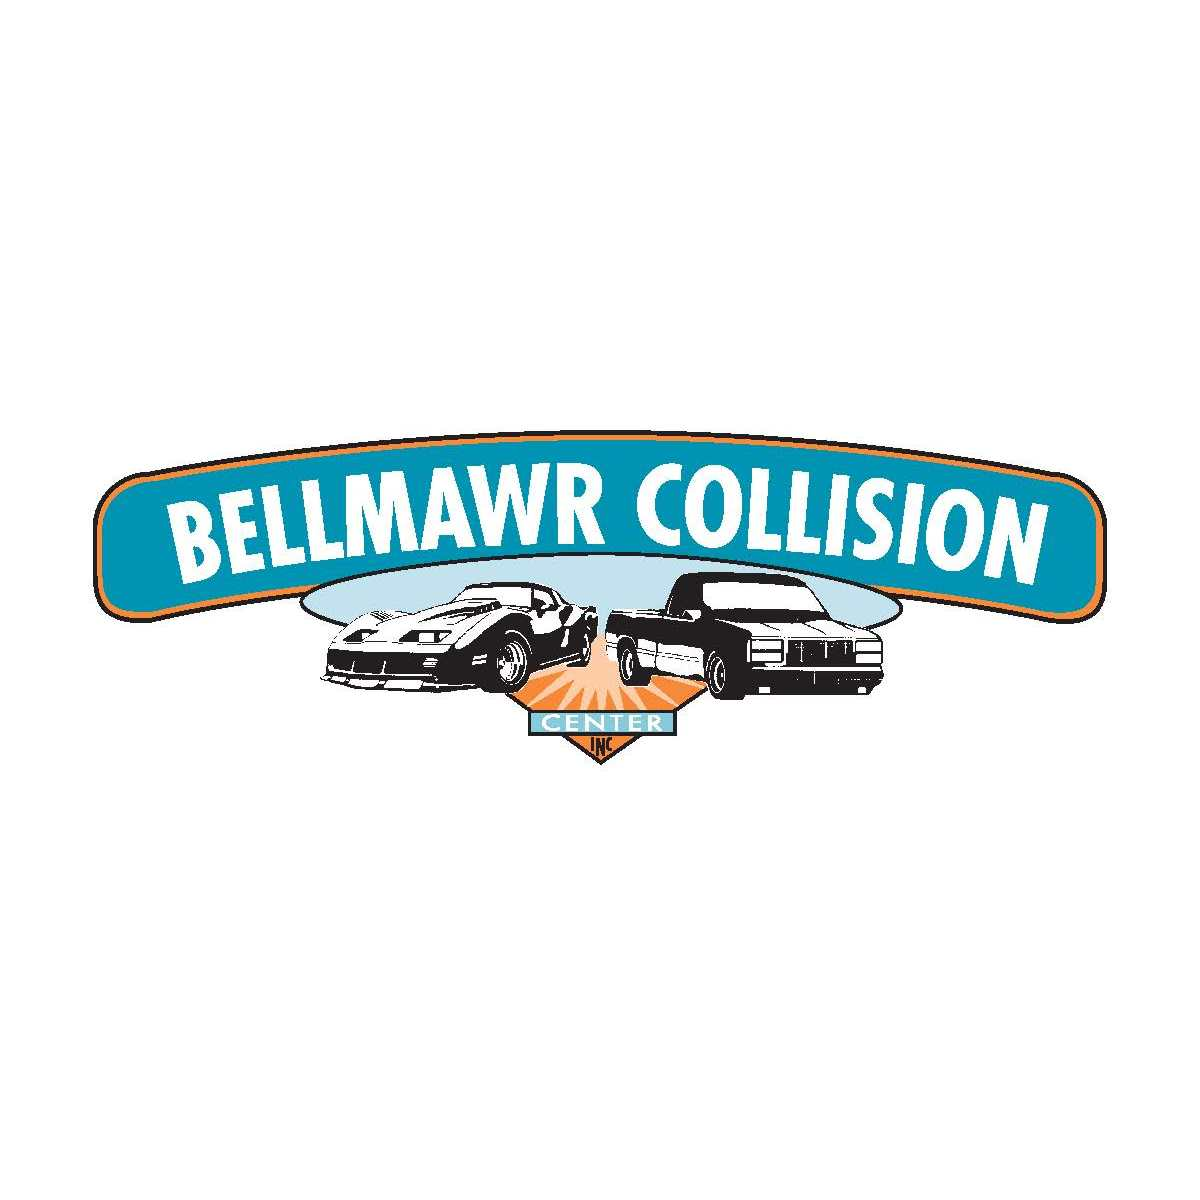 Bellmawr Collision Center, Inc.